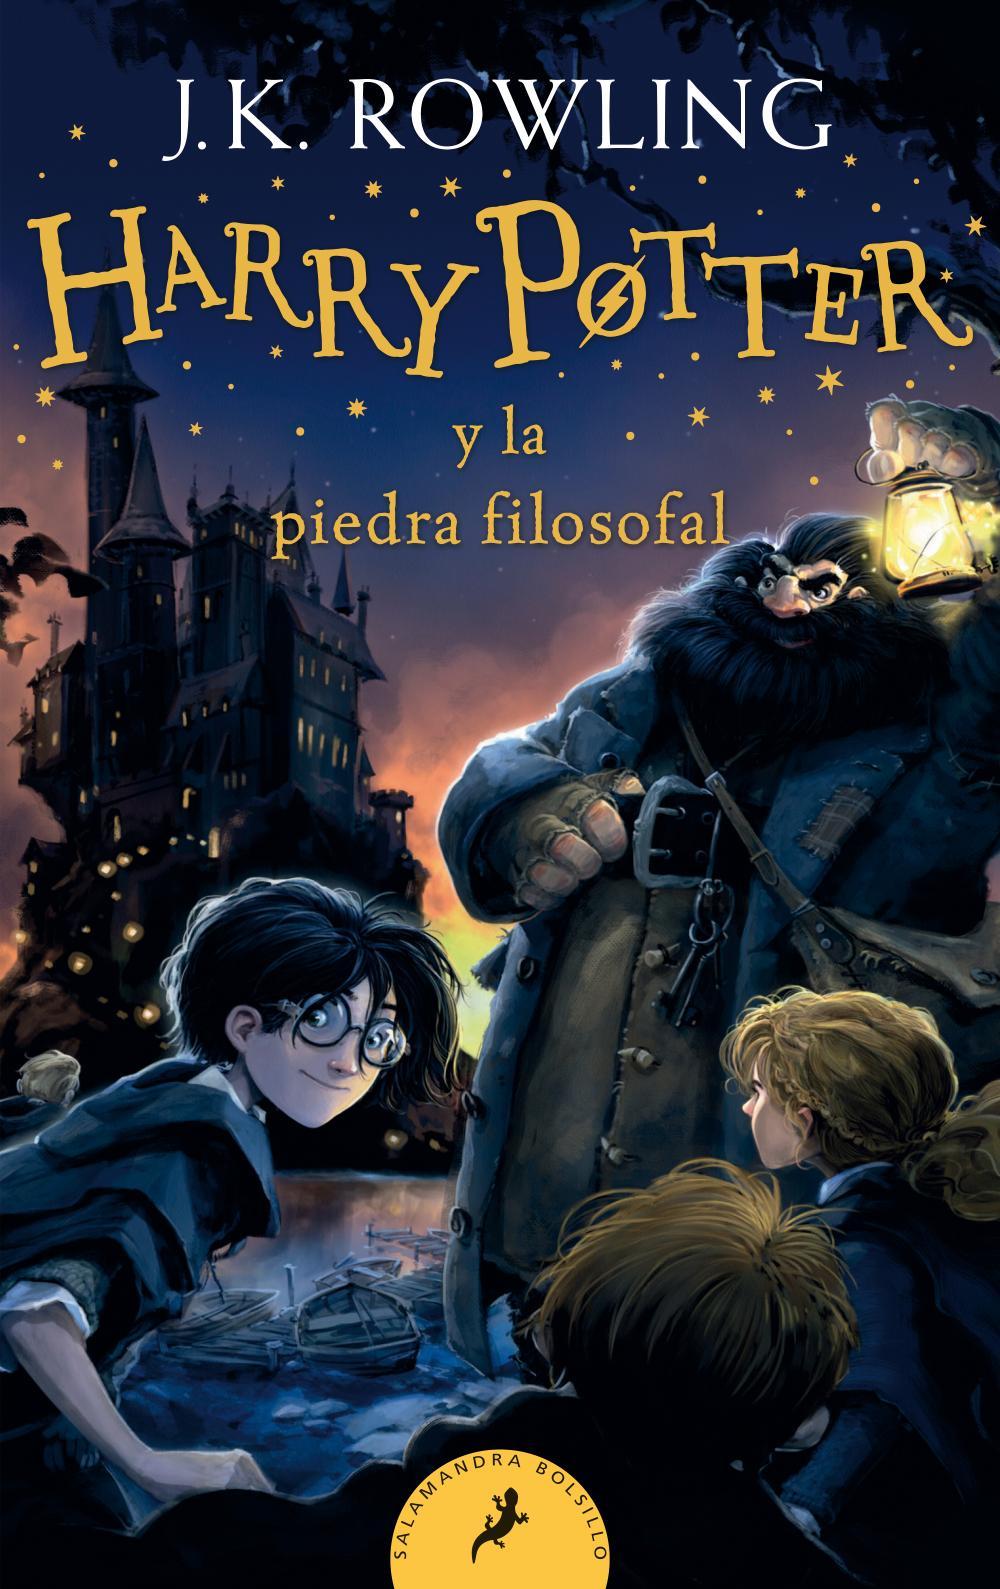 Harry Potter y la piedra filosofal (Harry Potter 1)